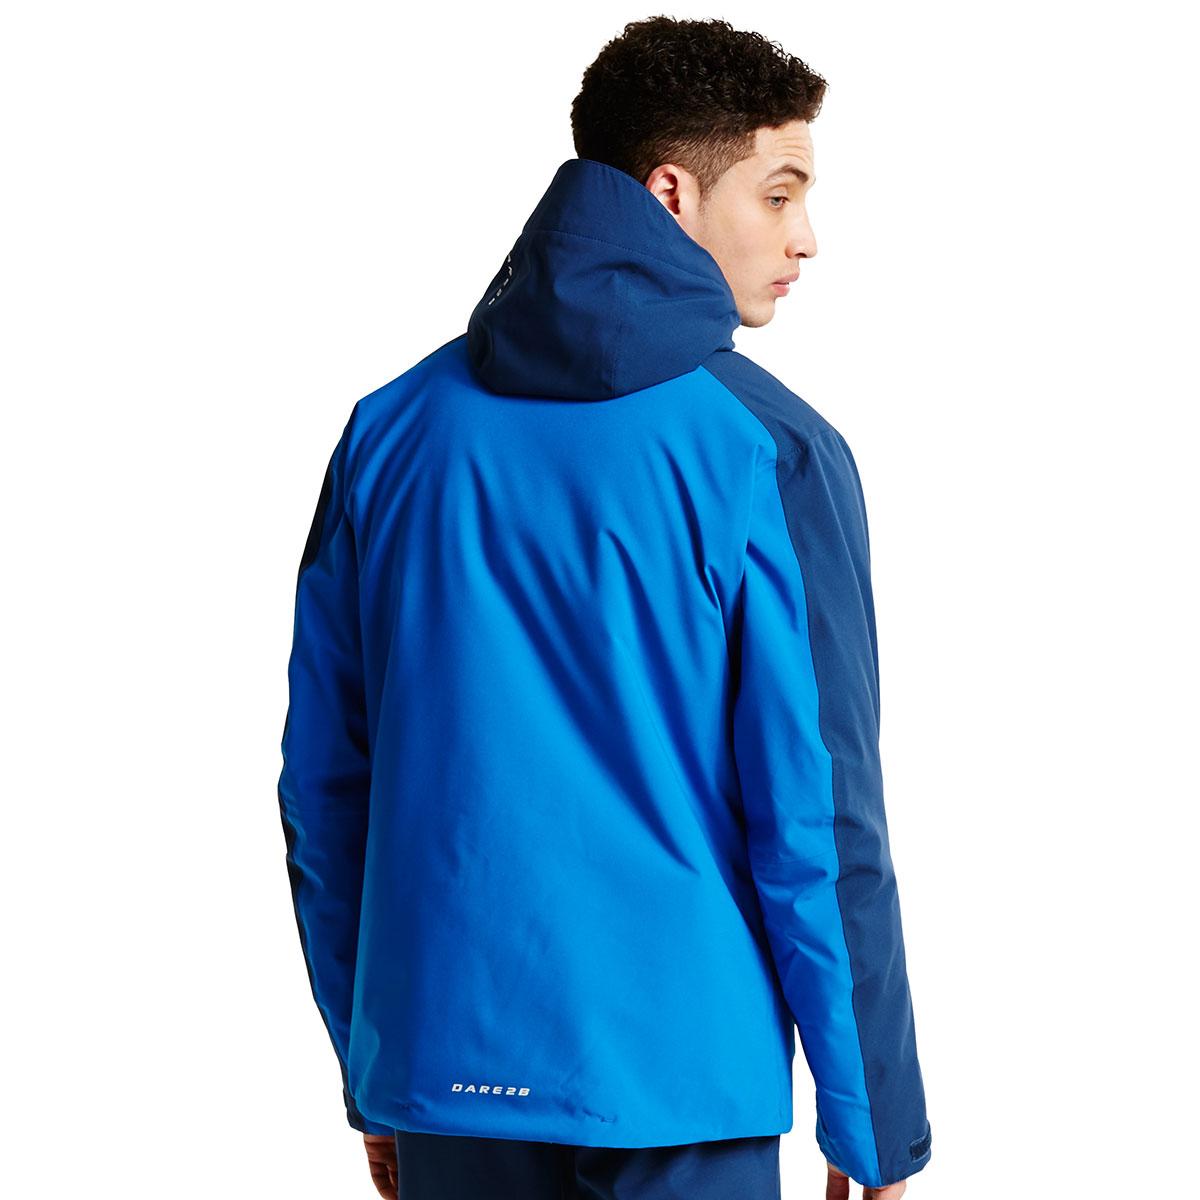 Dare2b Mens Immensity II Ski Snowboard Waterproof Coat Jacket 56/% OFF RRP